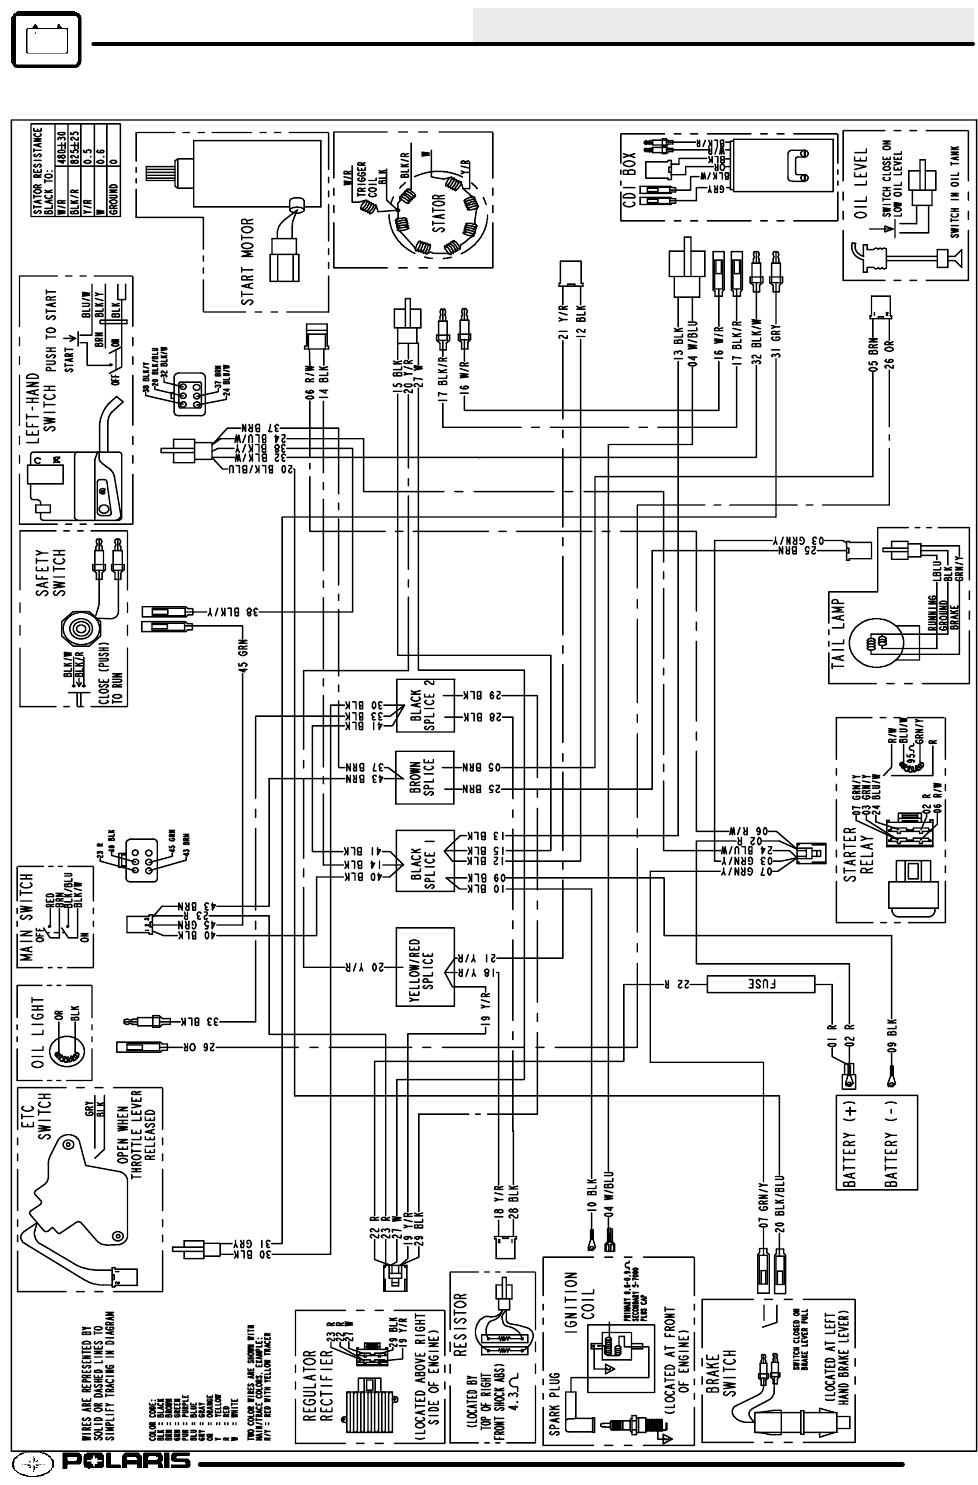 Viva 250 Quad Wiring Diagram Diagram Of 1996 Cadillac Sedan – Lifan 140 Wiring-diagram